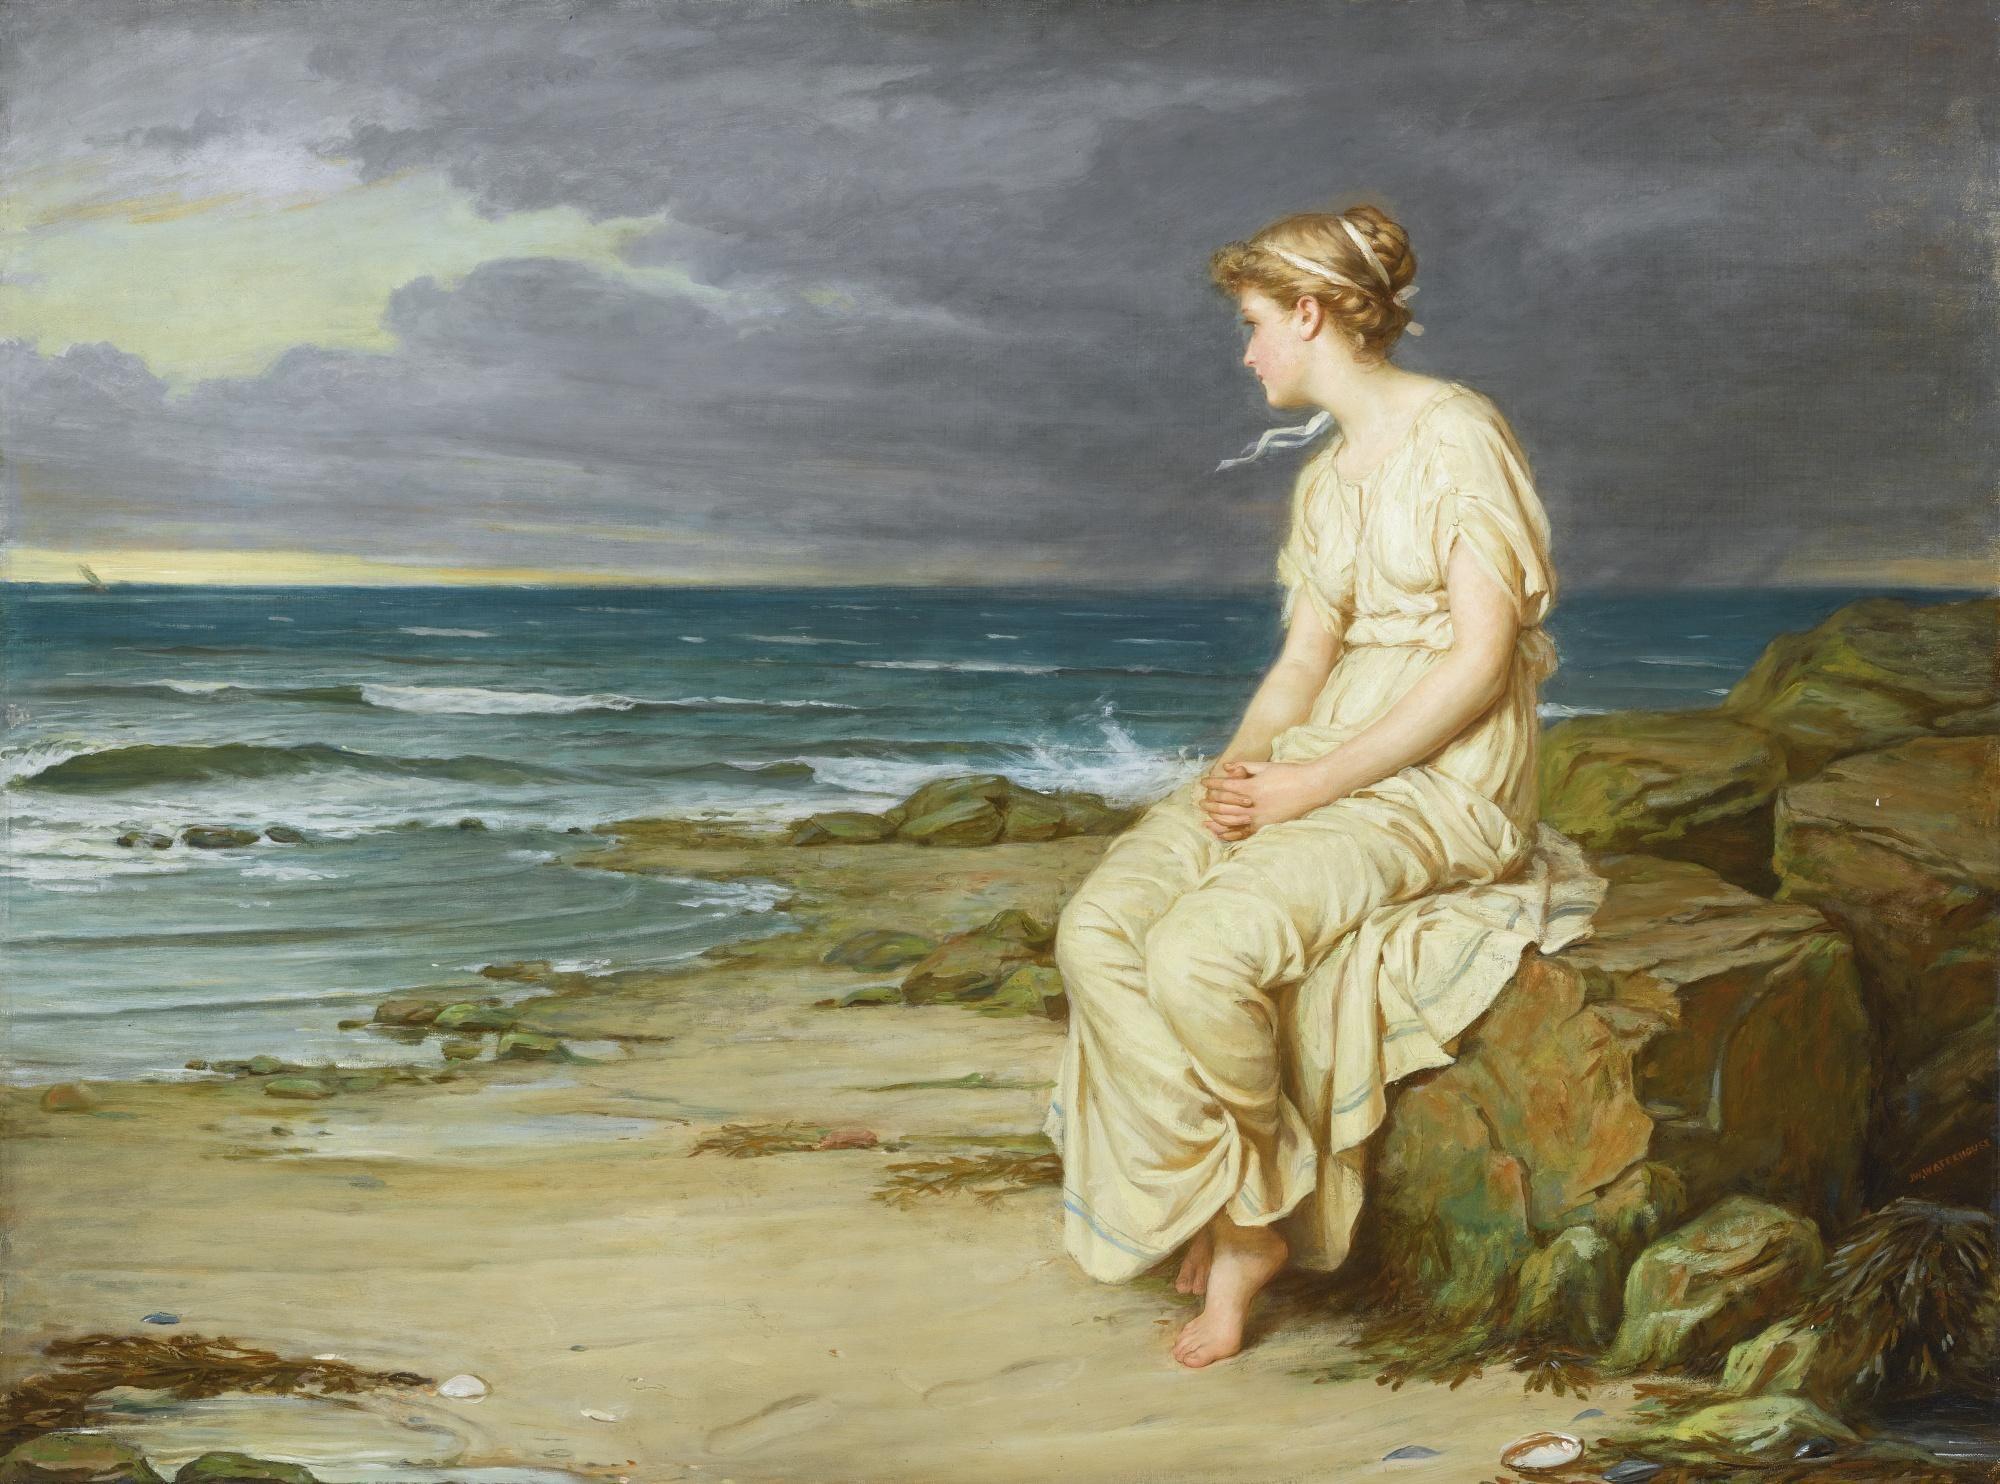 John William Waterhouse (1849-1917) Miranda (76 by 101,5 cm)